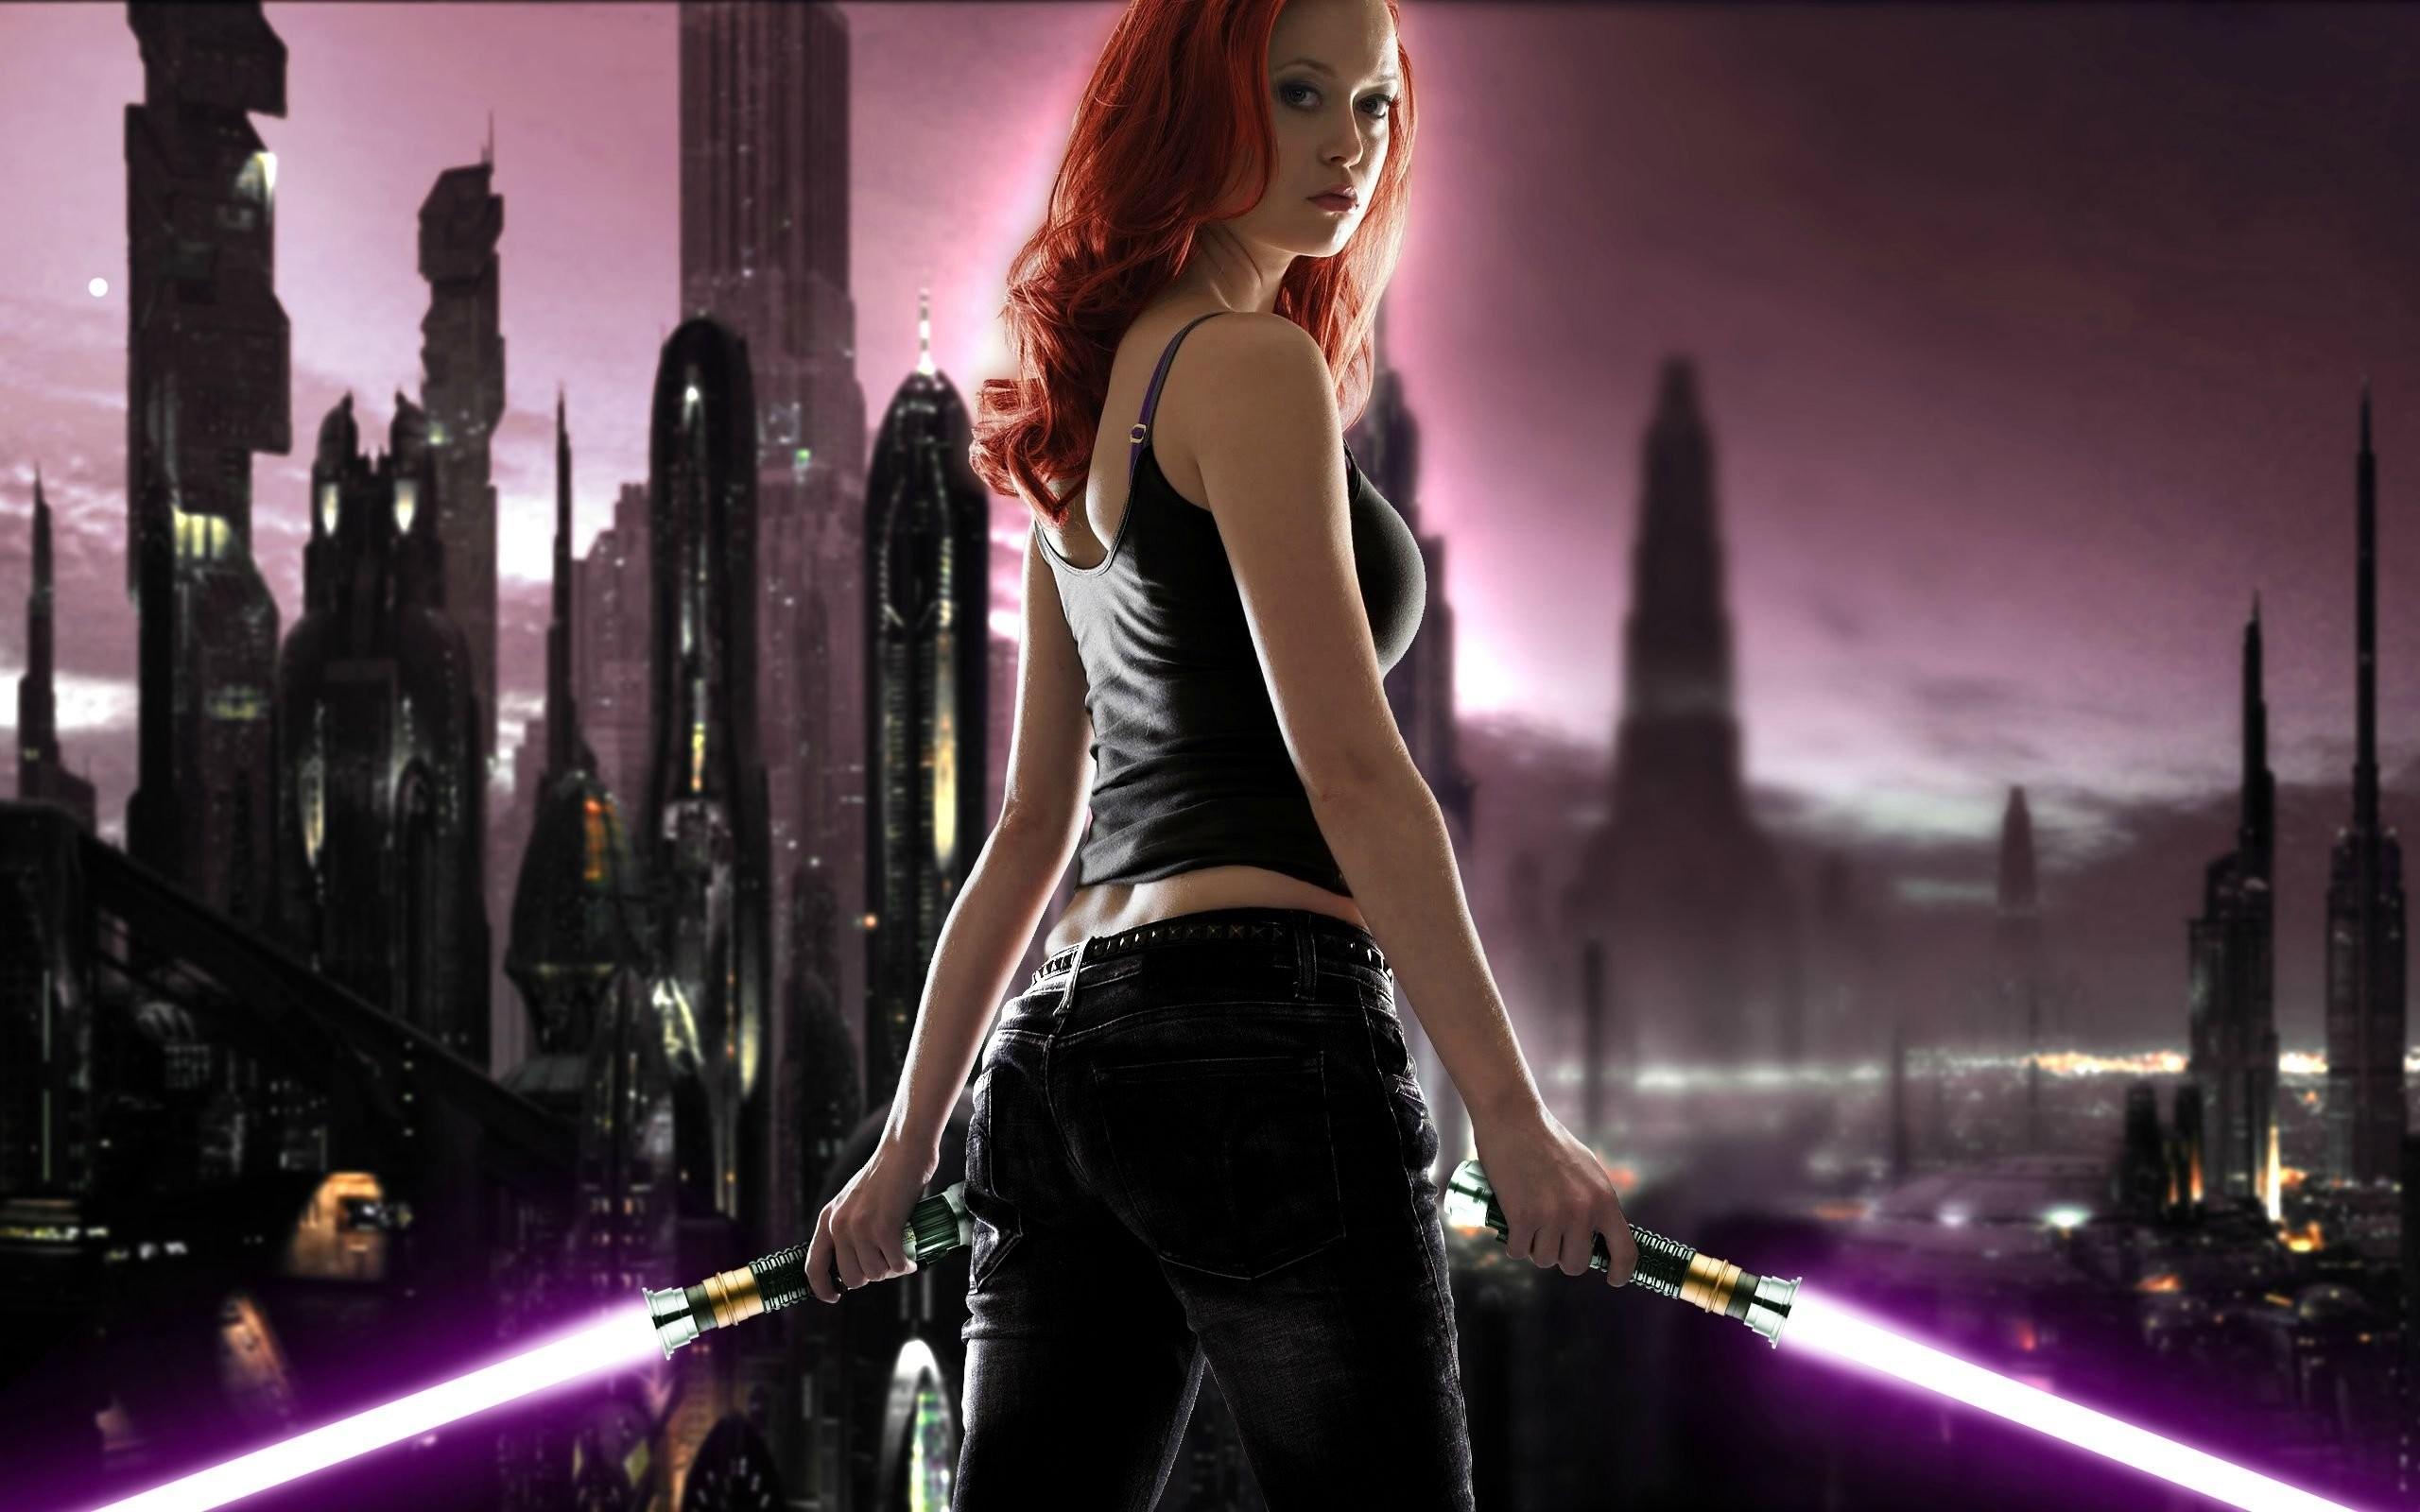 Panoramic Star Wars Wallpaper 3840x1080 54 Images